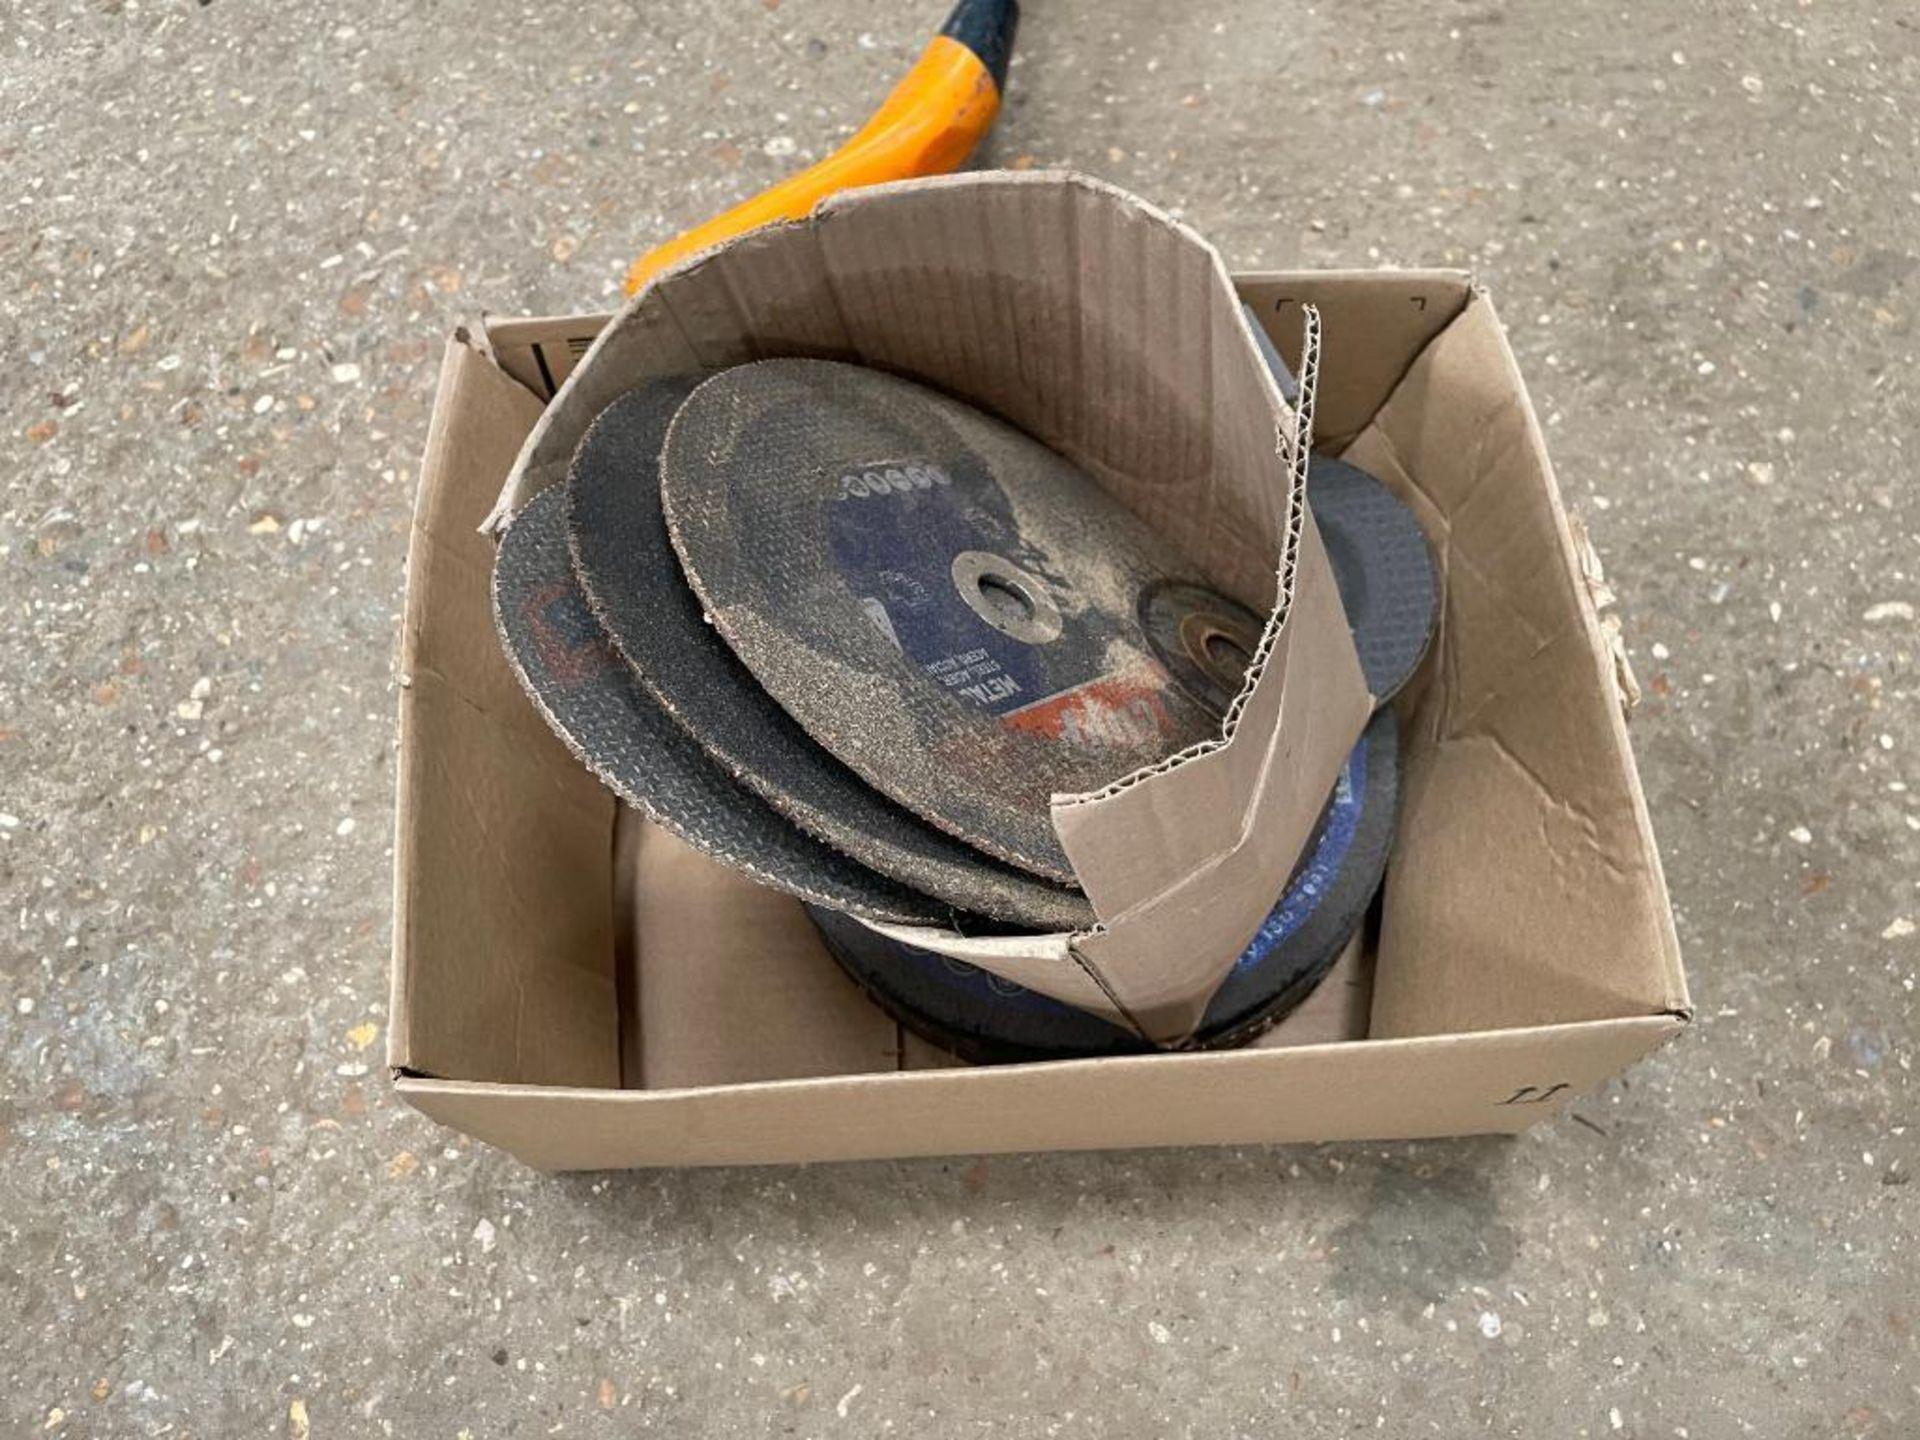 Quantity grinding discs - Image 2 of 2